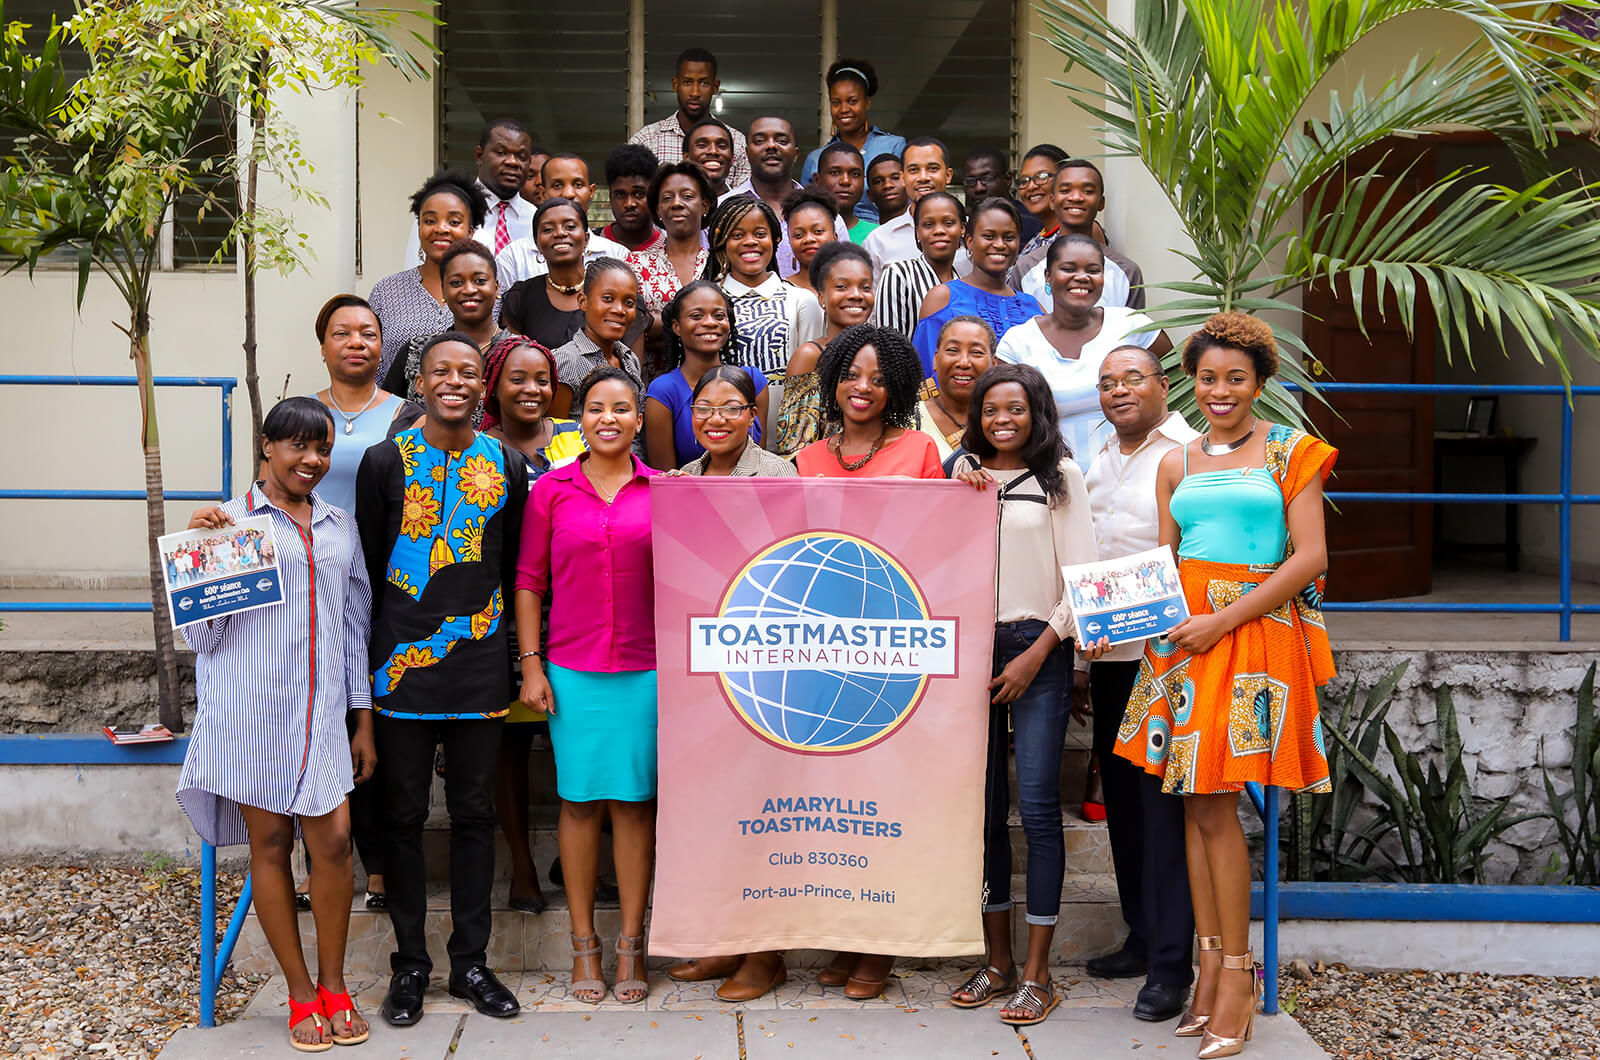 The Amaryllis Toastmasters club in Port-au-Prince, Haïti, celebrates its 600th meeting.